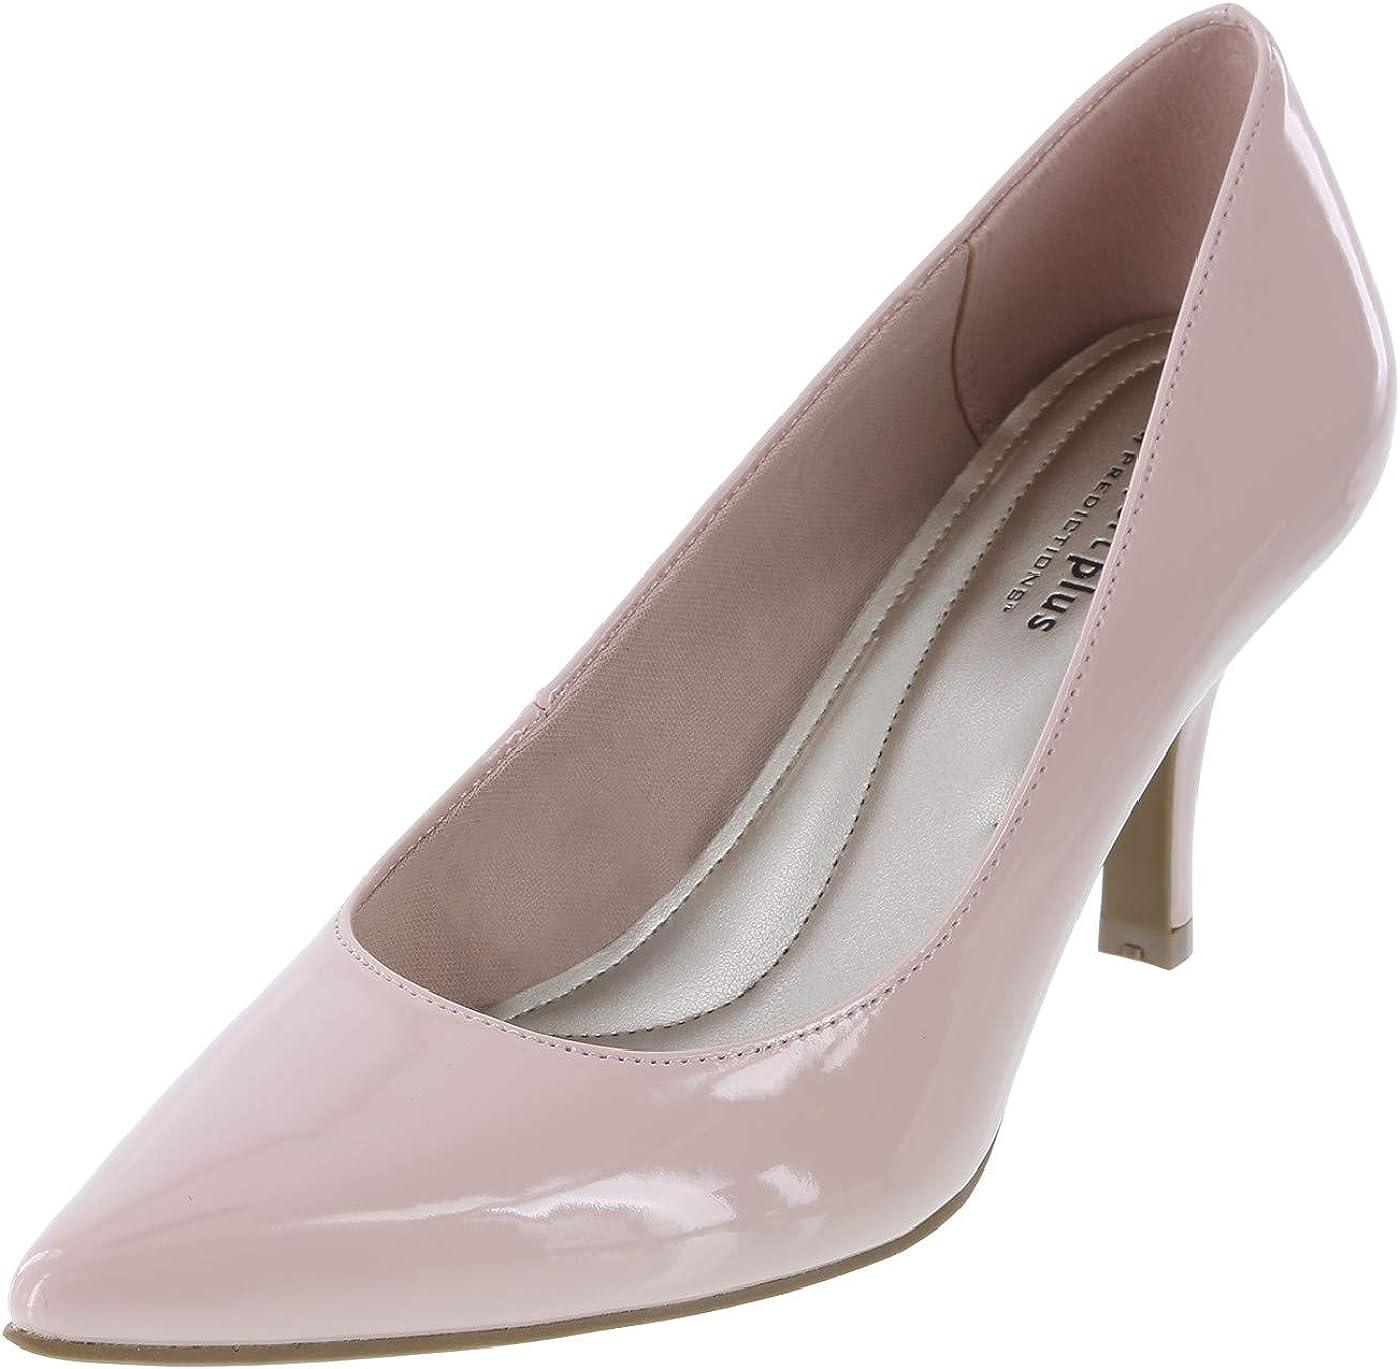 Predictions Comfort Plus Women S Blush Patent Janine Pointy Toe Pump 6 5 Regular Amazon Ca Shoes Handbags